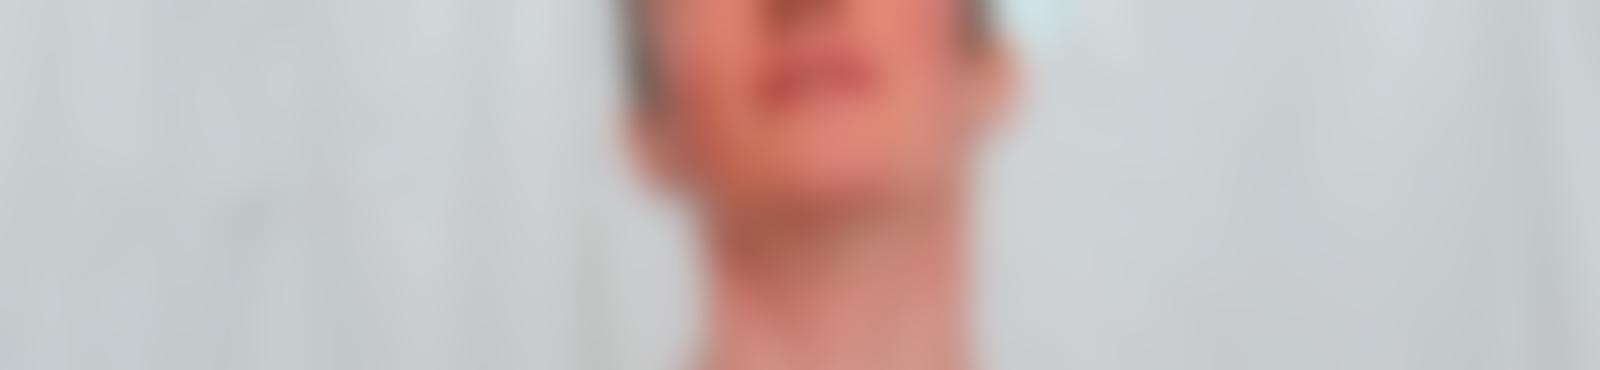 Blurred c50d323d 7fa5 45af 8a94 719188e145ad